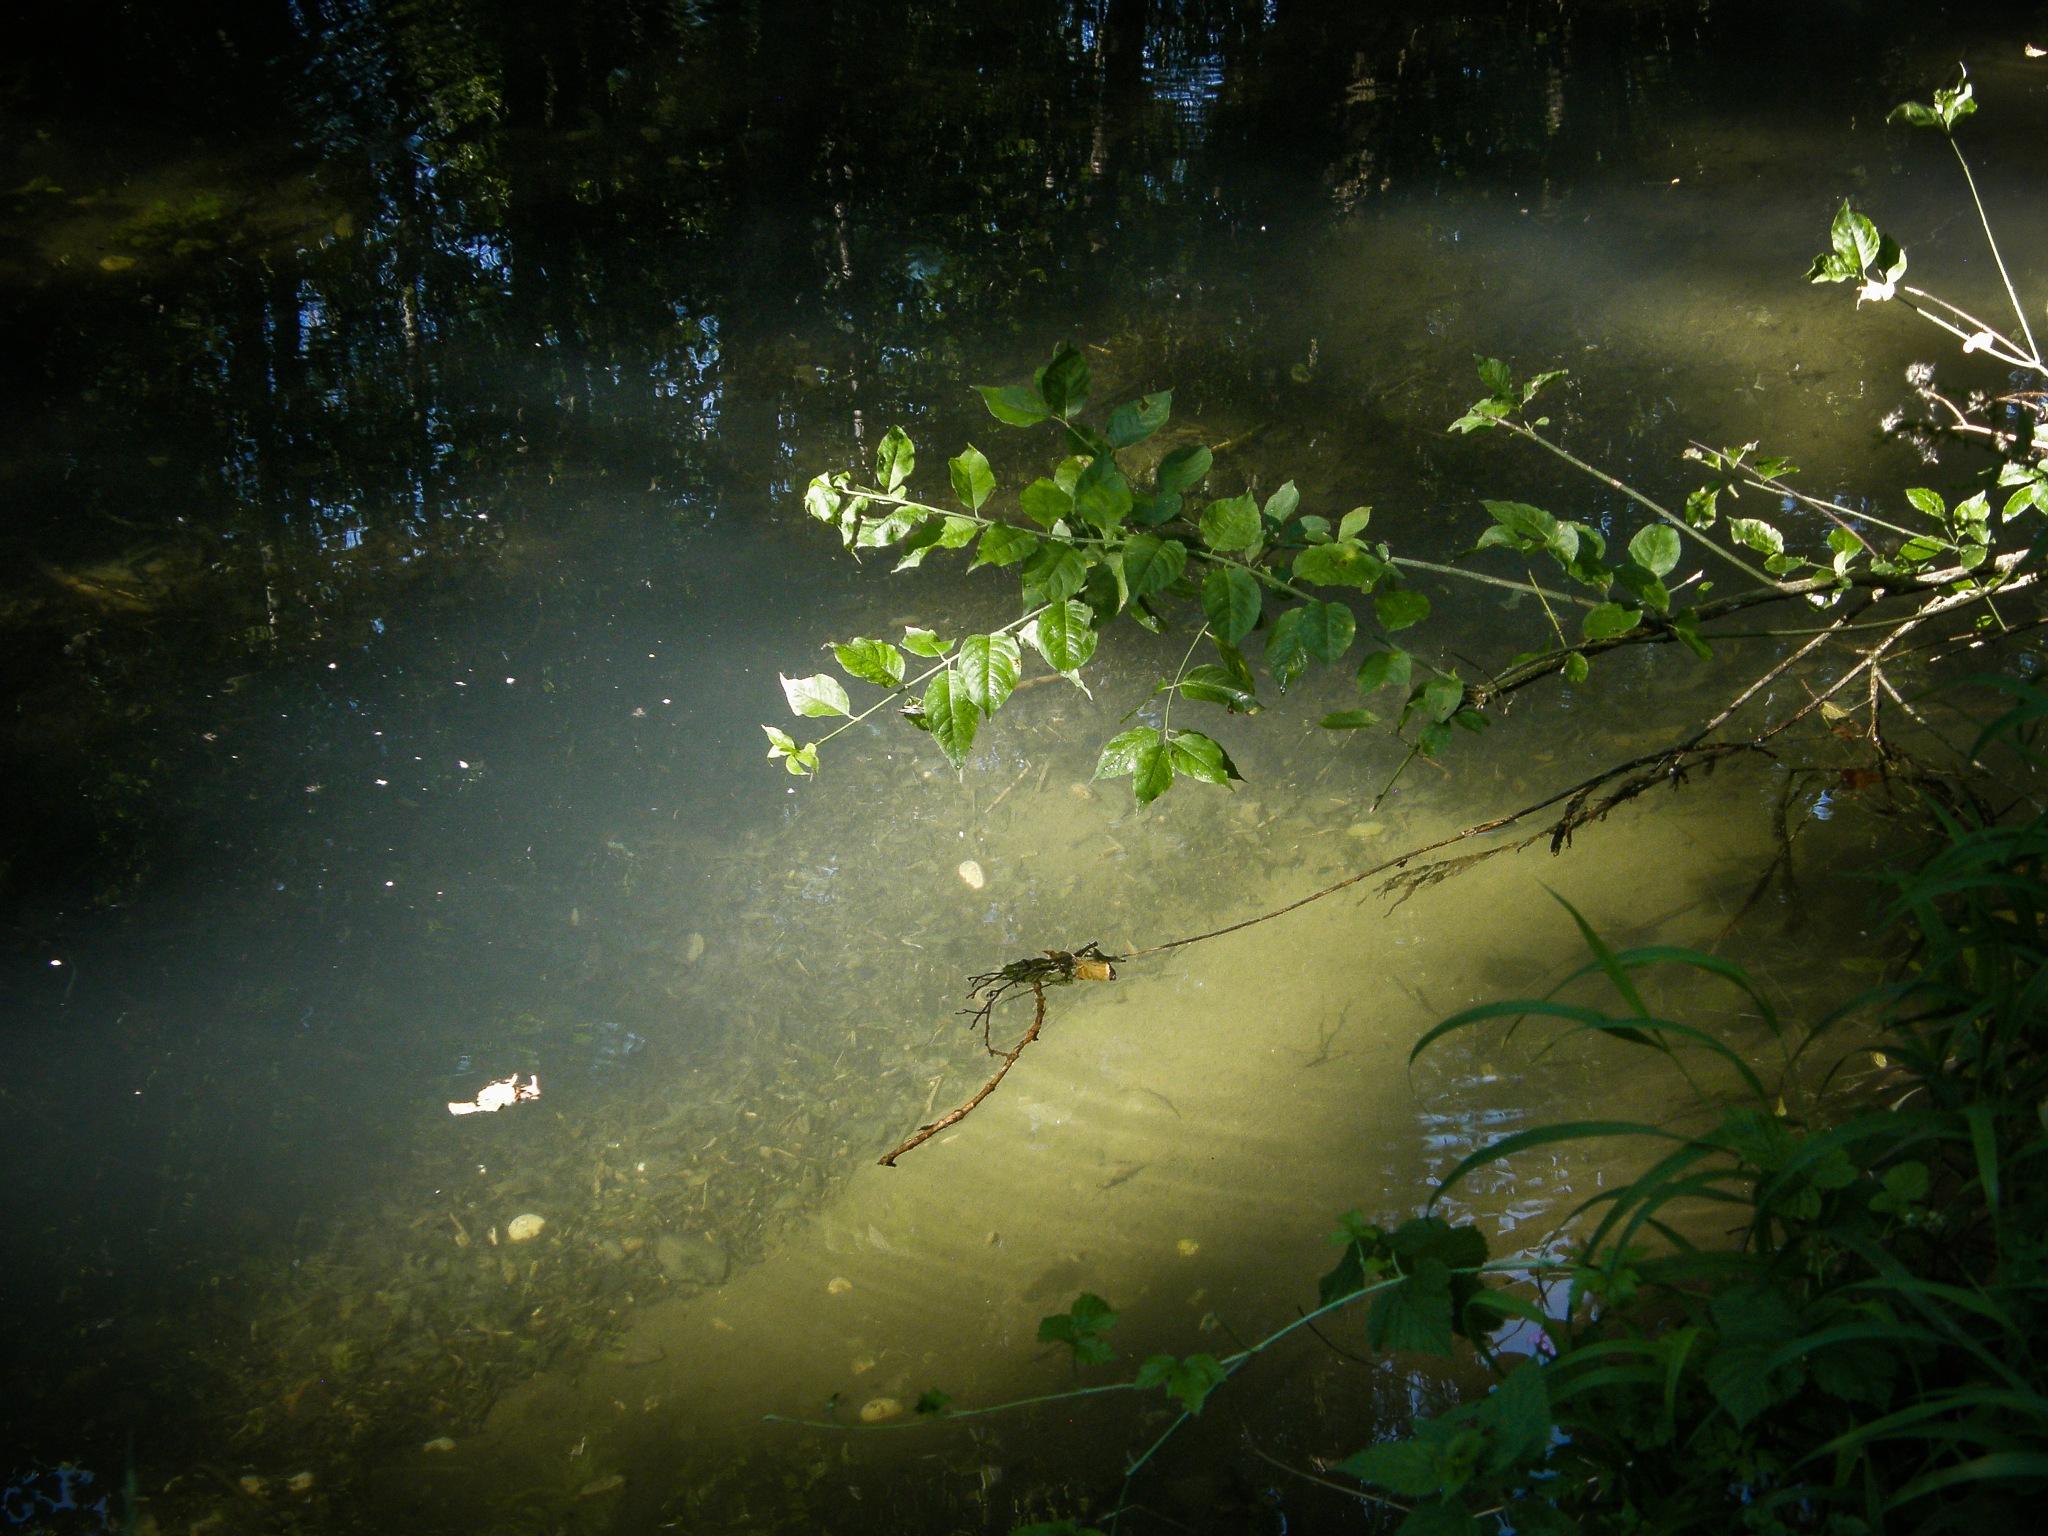 Dernier rayon en forêt by Anaxagore